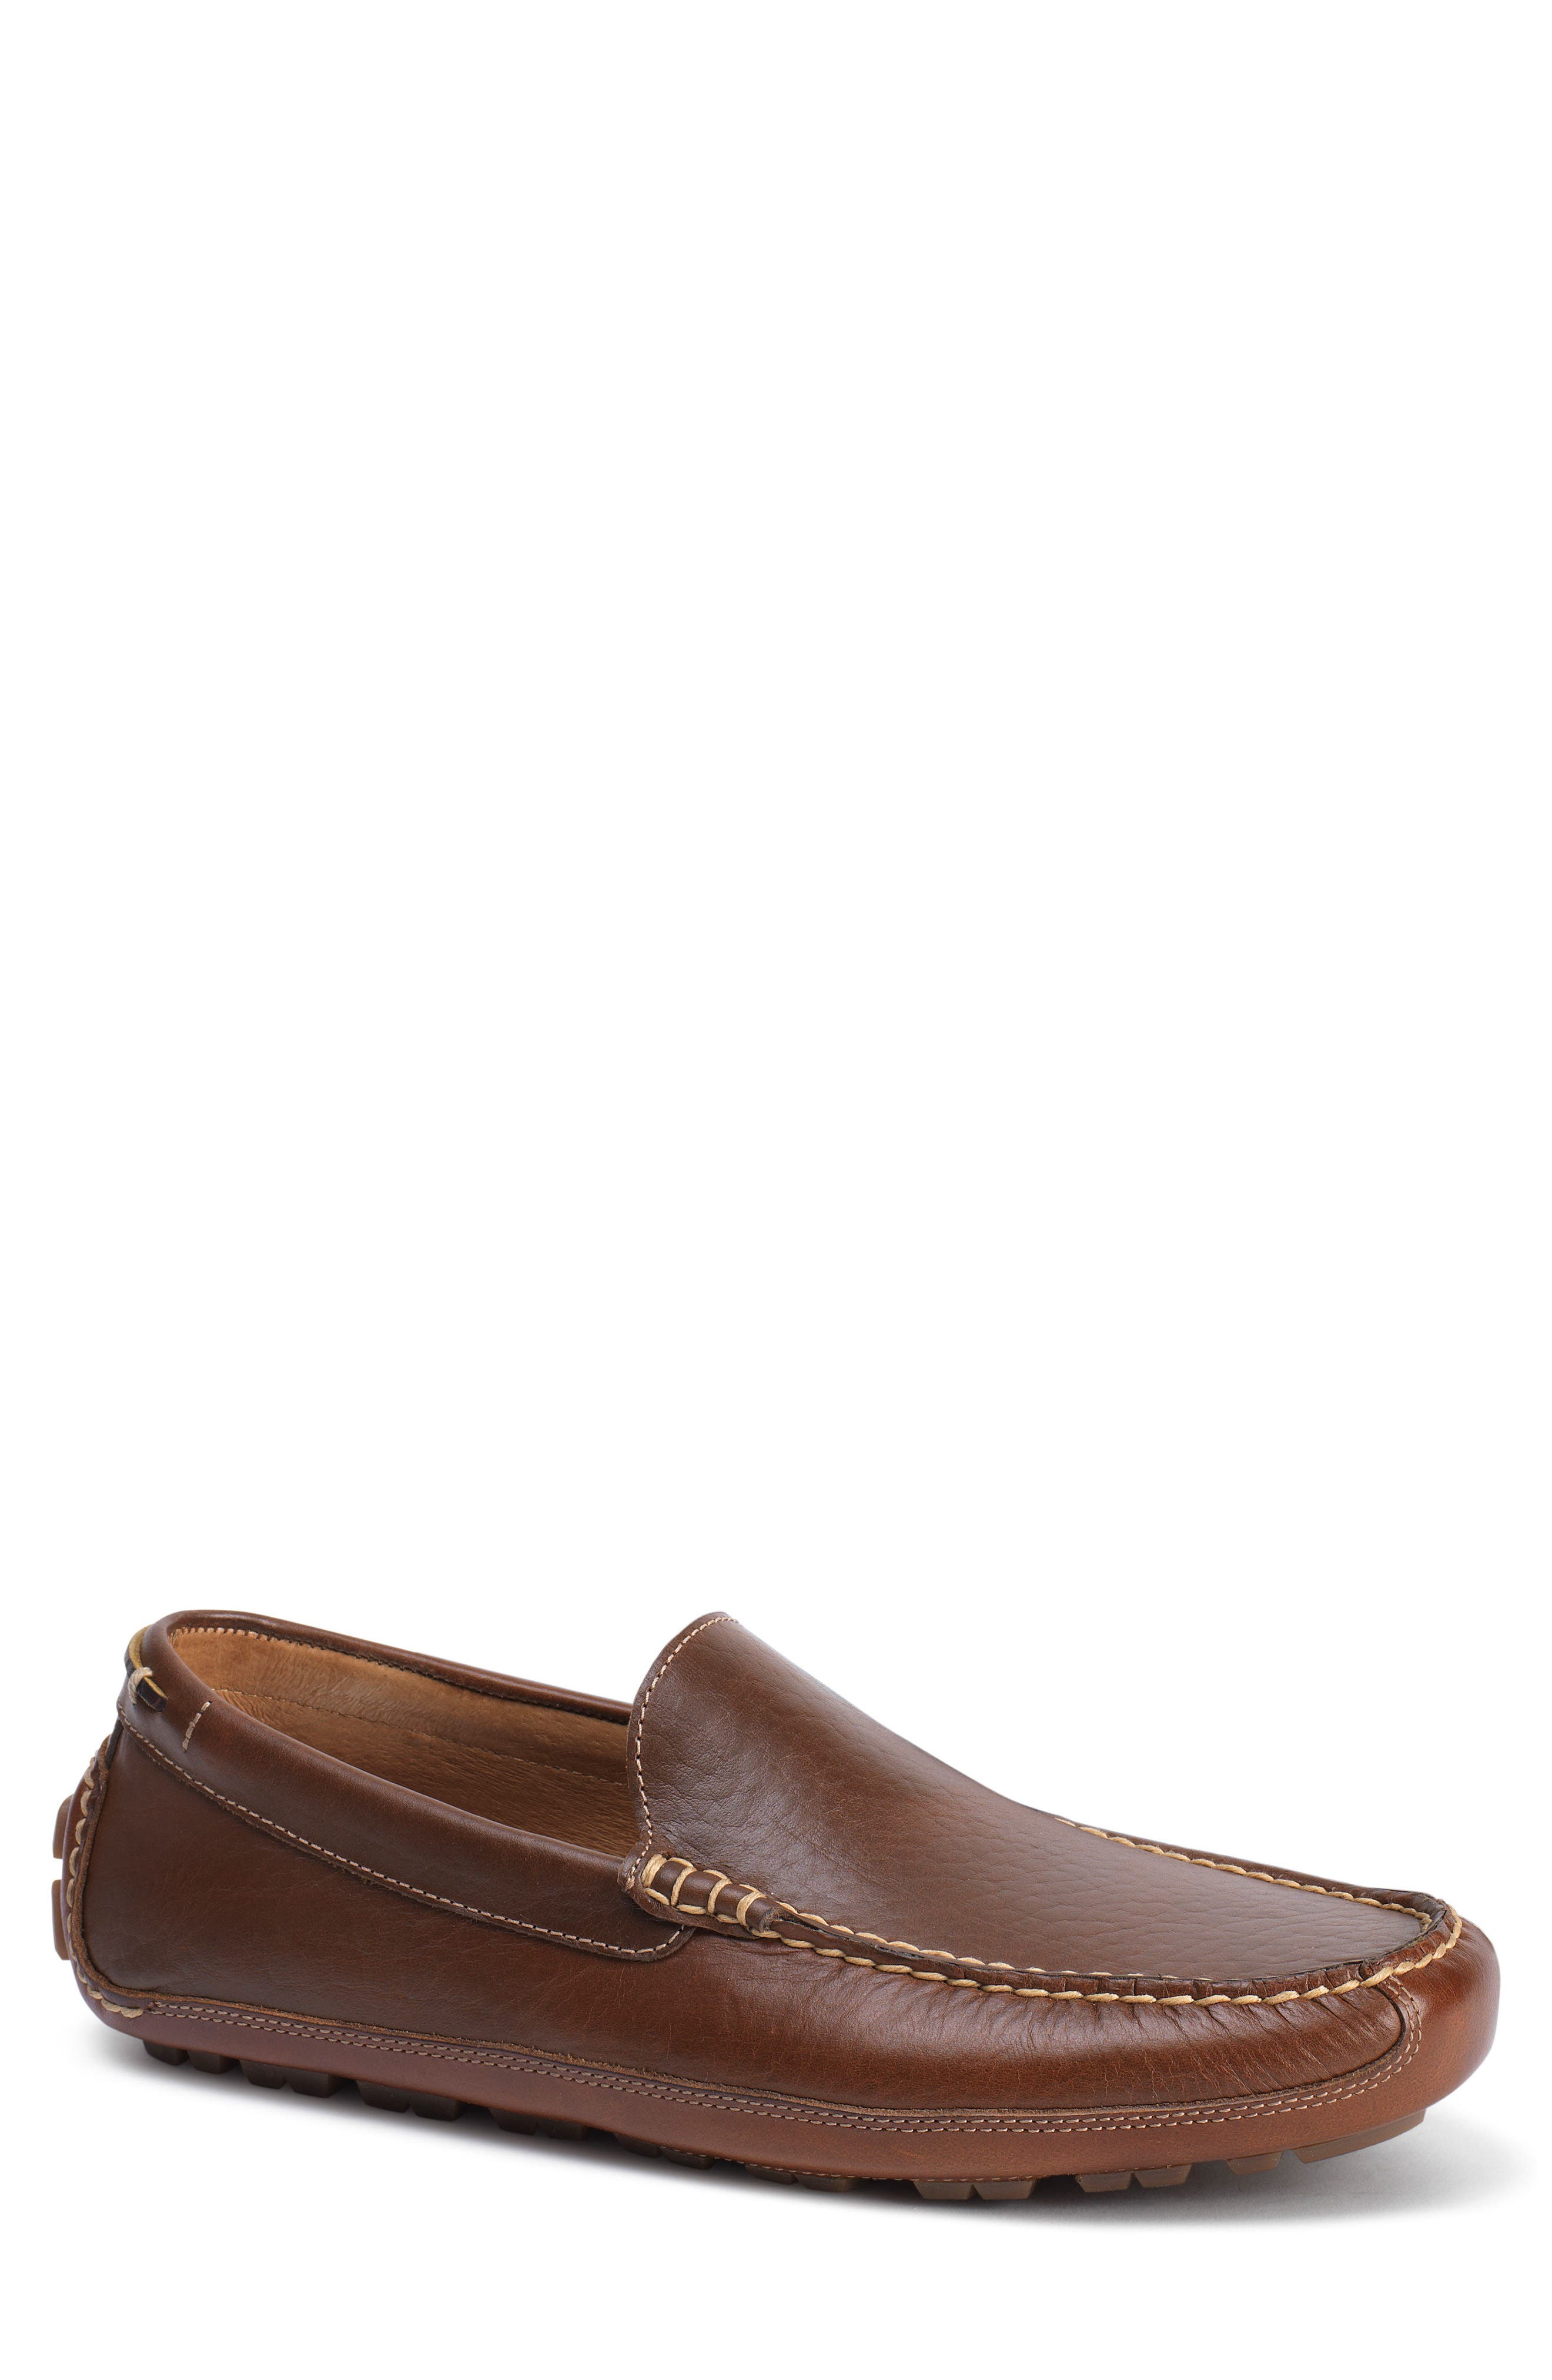 Dean Driving Shoe,                             Main thumbnail 1, color,                             Saddle Tan Leather